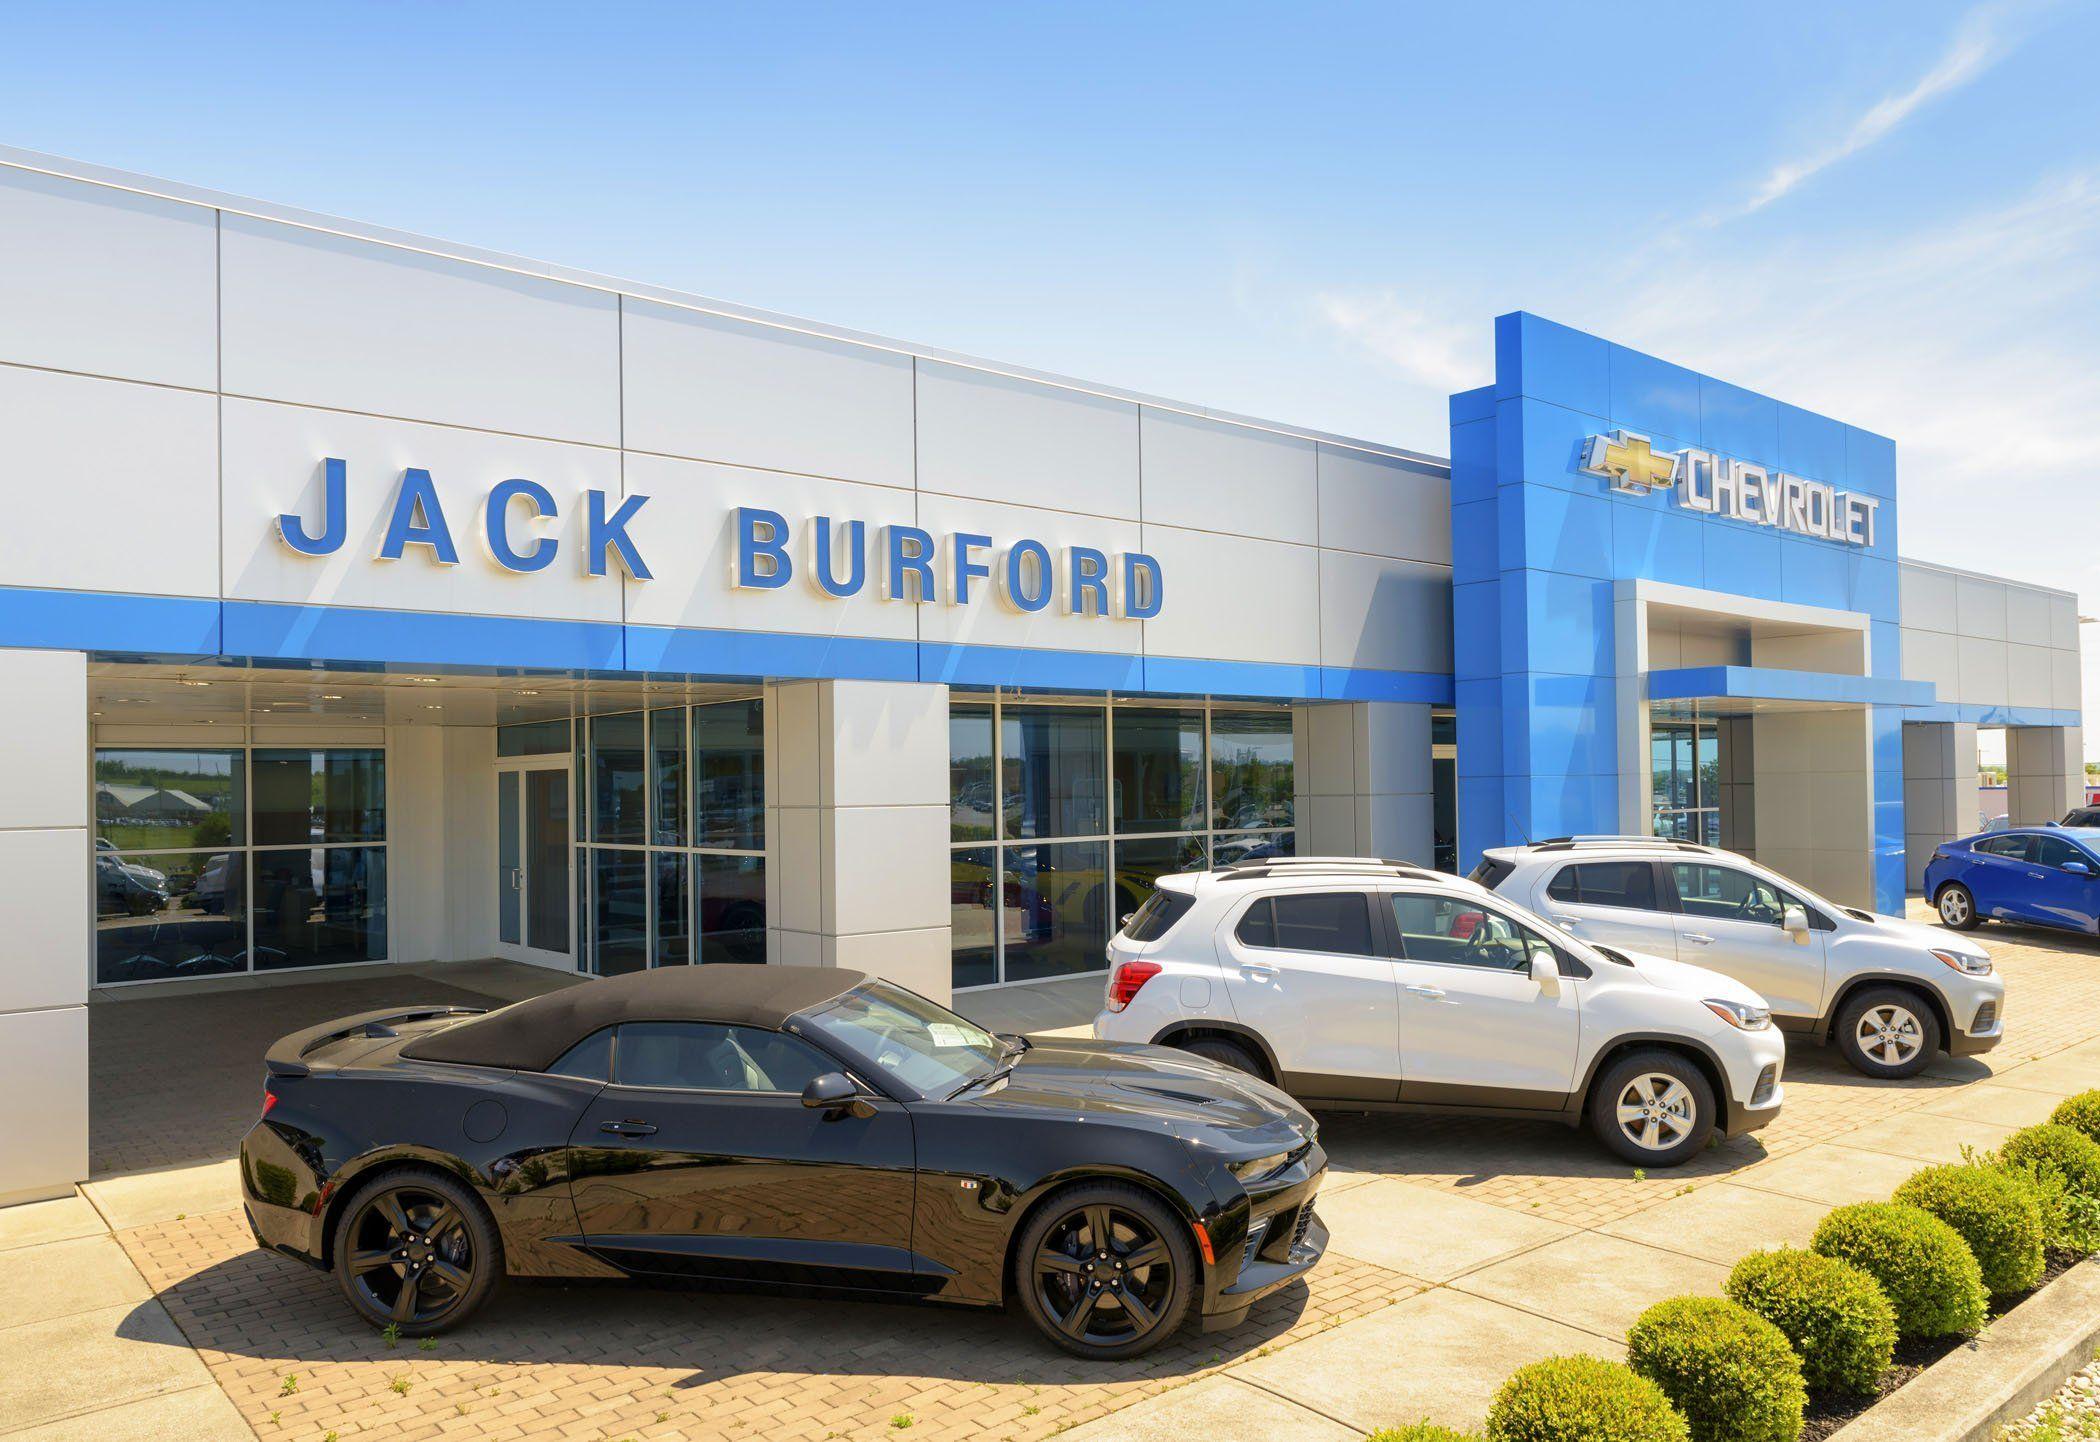 Car Dealerships In Richmond Ky_1804 Car dealership